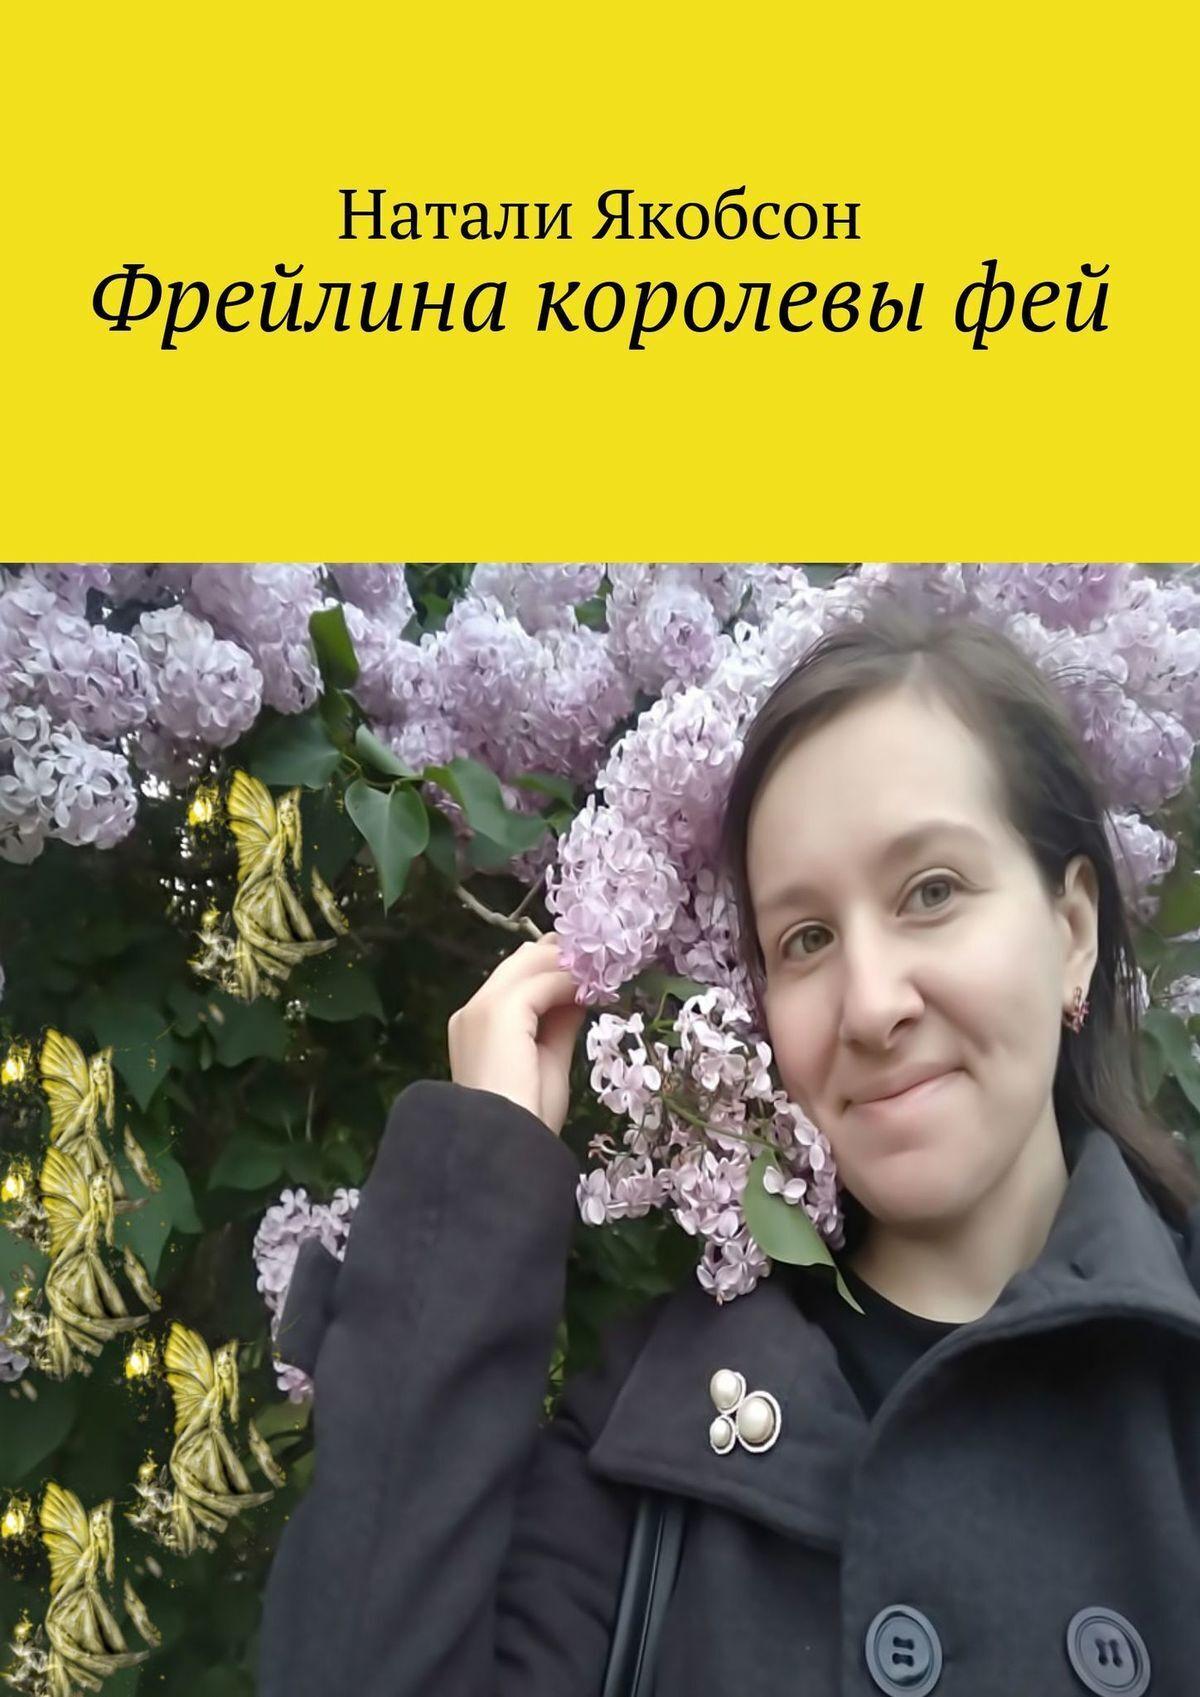 Фрейлина королевыфей